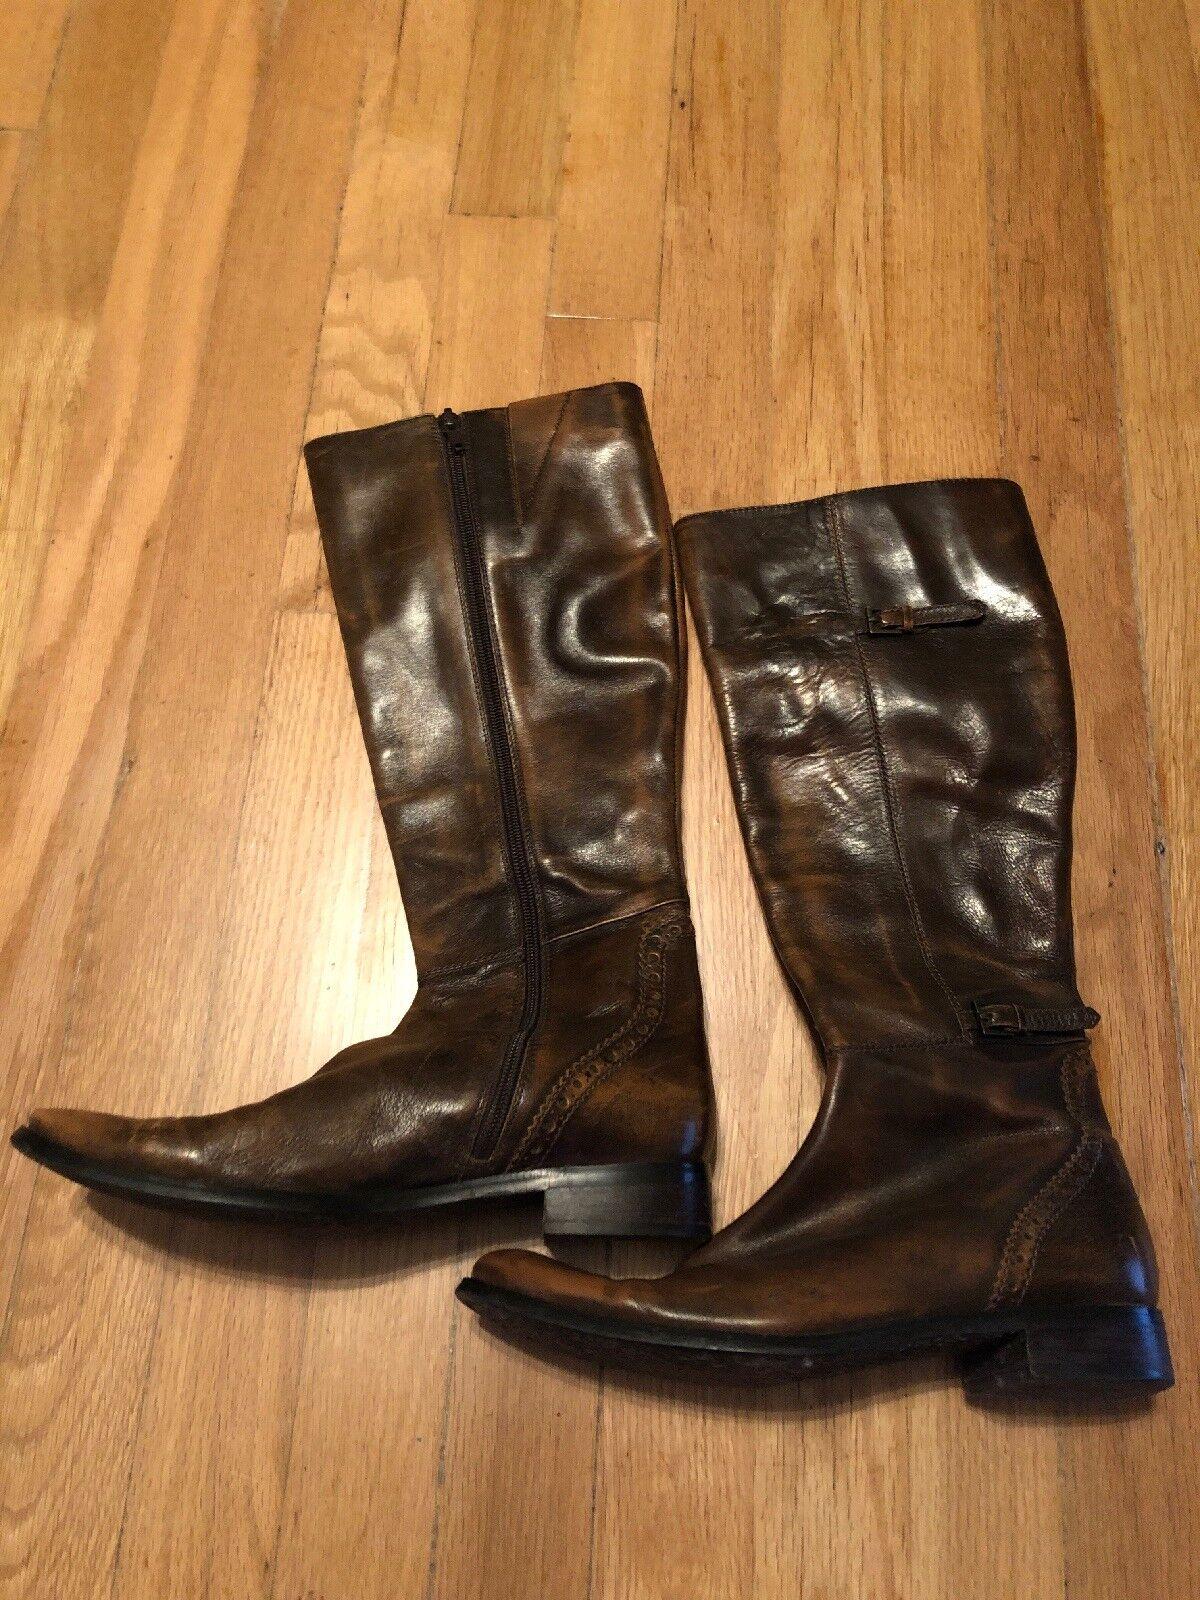 Valerie Stevens Val Flex Brown Leather Below Knee Boots Size 6 Women's